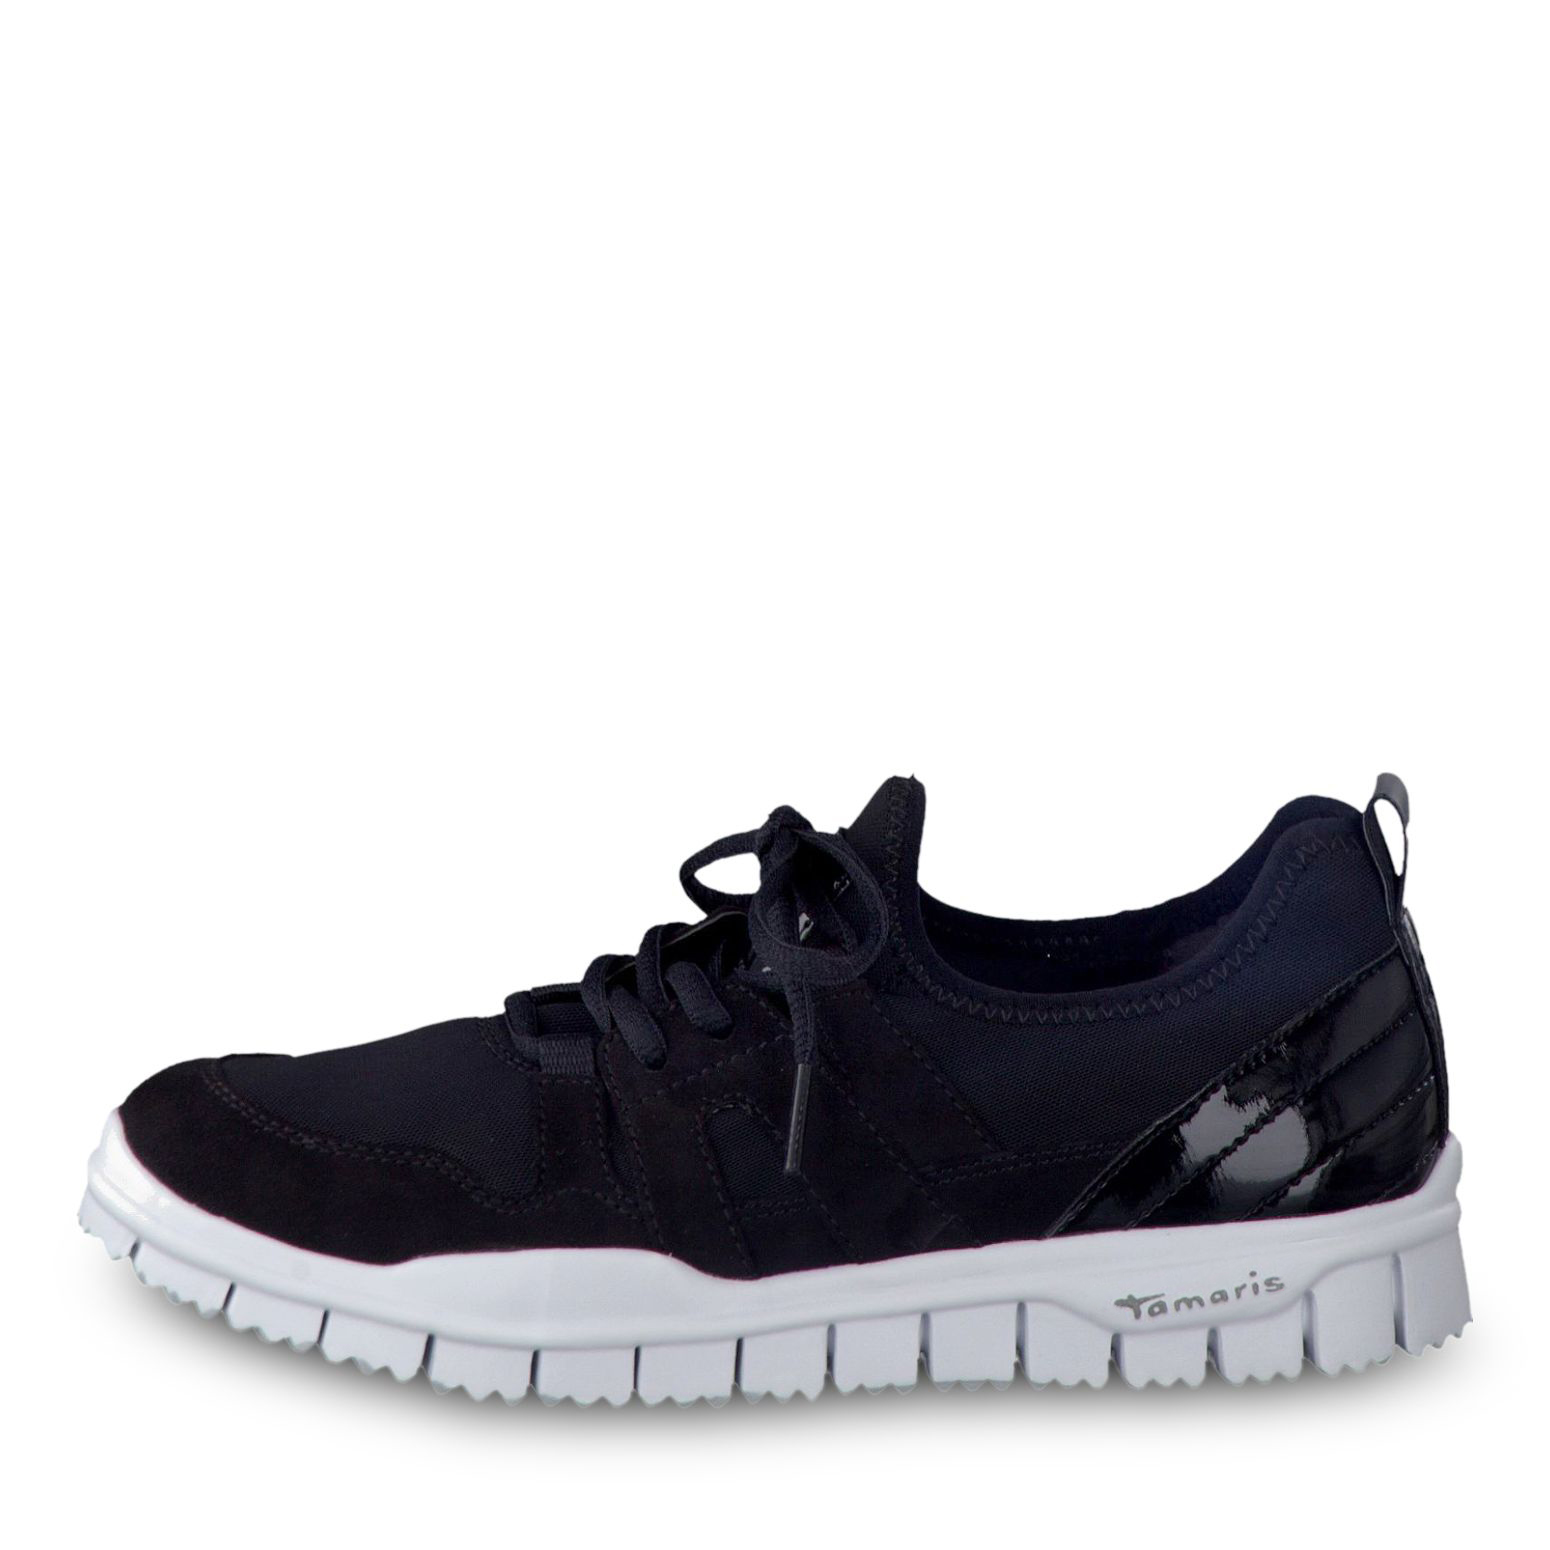 penola 1 1 23651 38 buy tamaris sneakers online. Black Bedroom Furniture Sets. Home Design Ideas